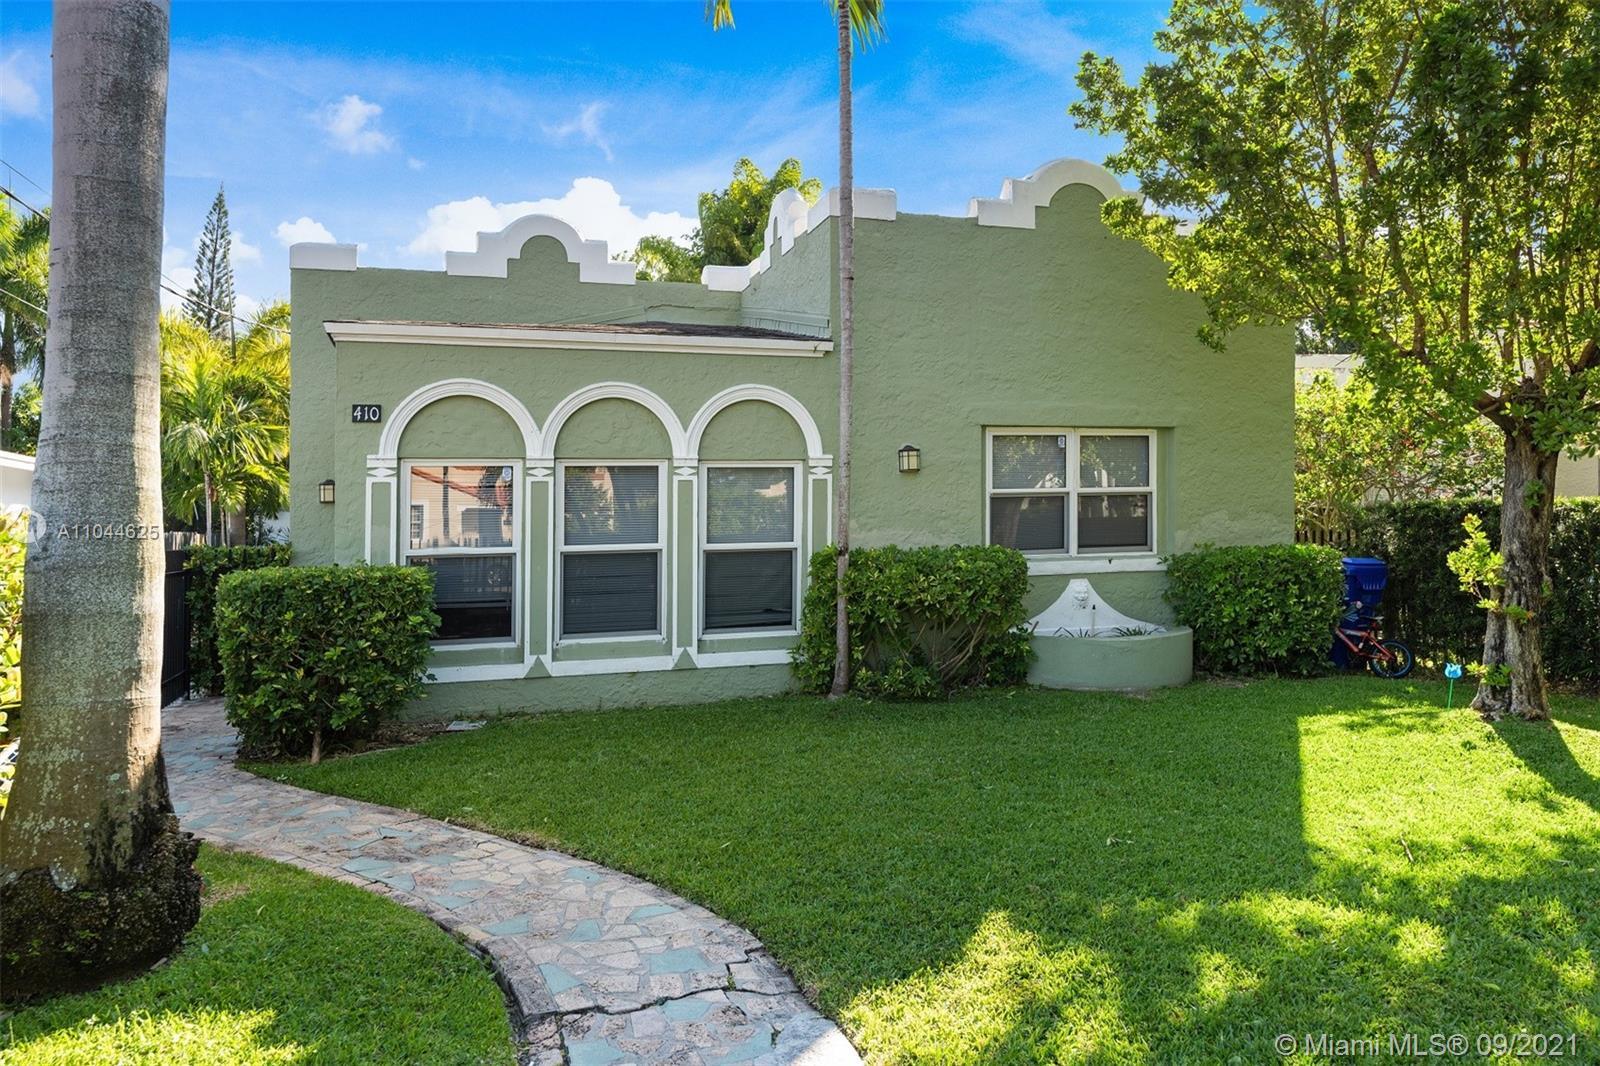 410 22nd Rd, Miami, Florida 33129